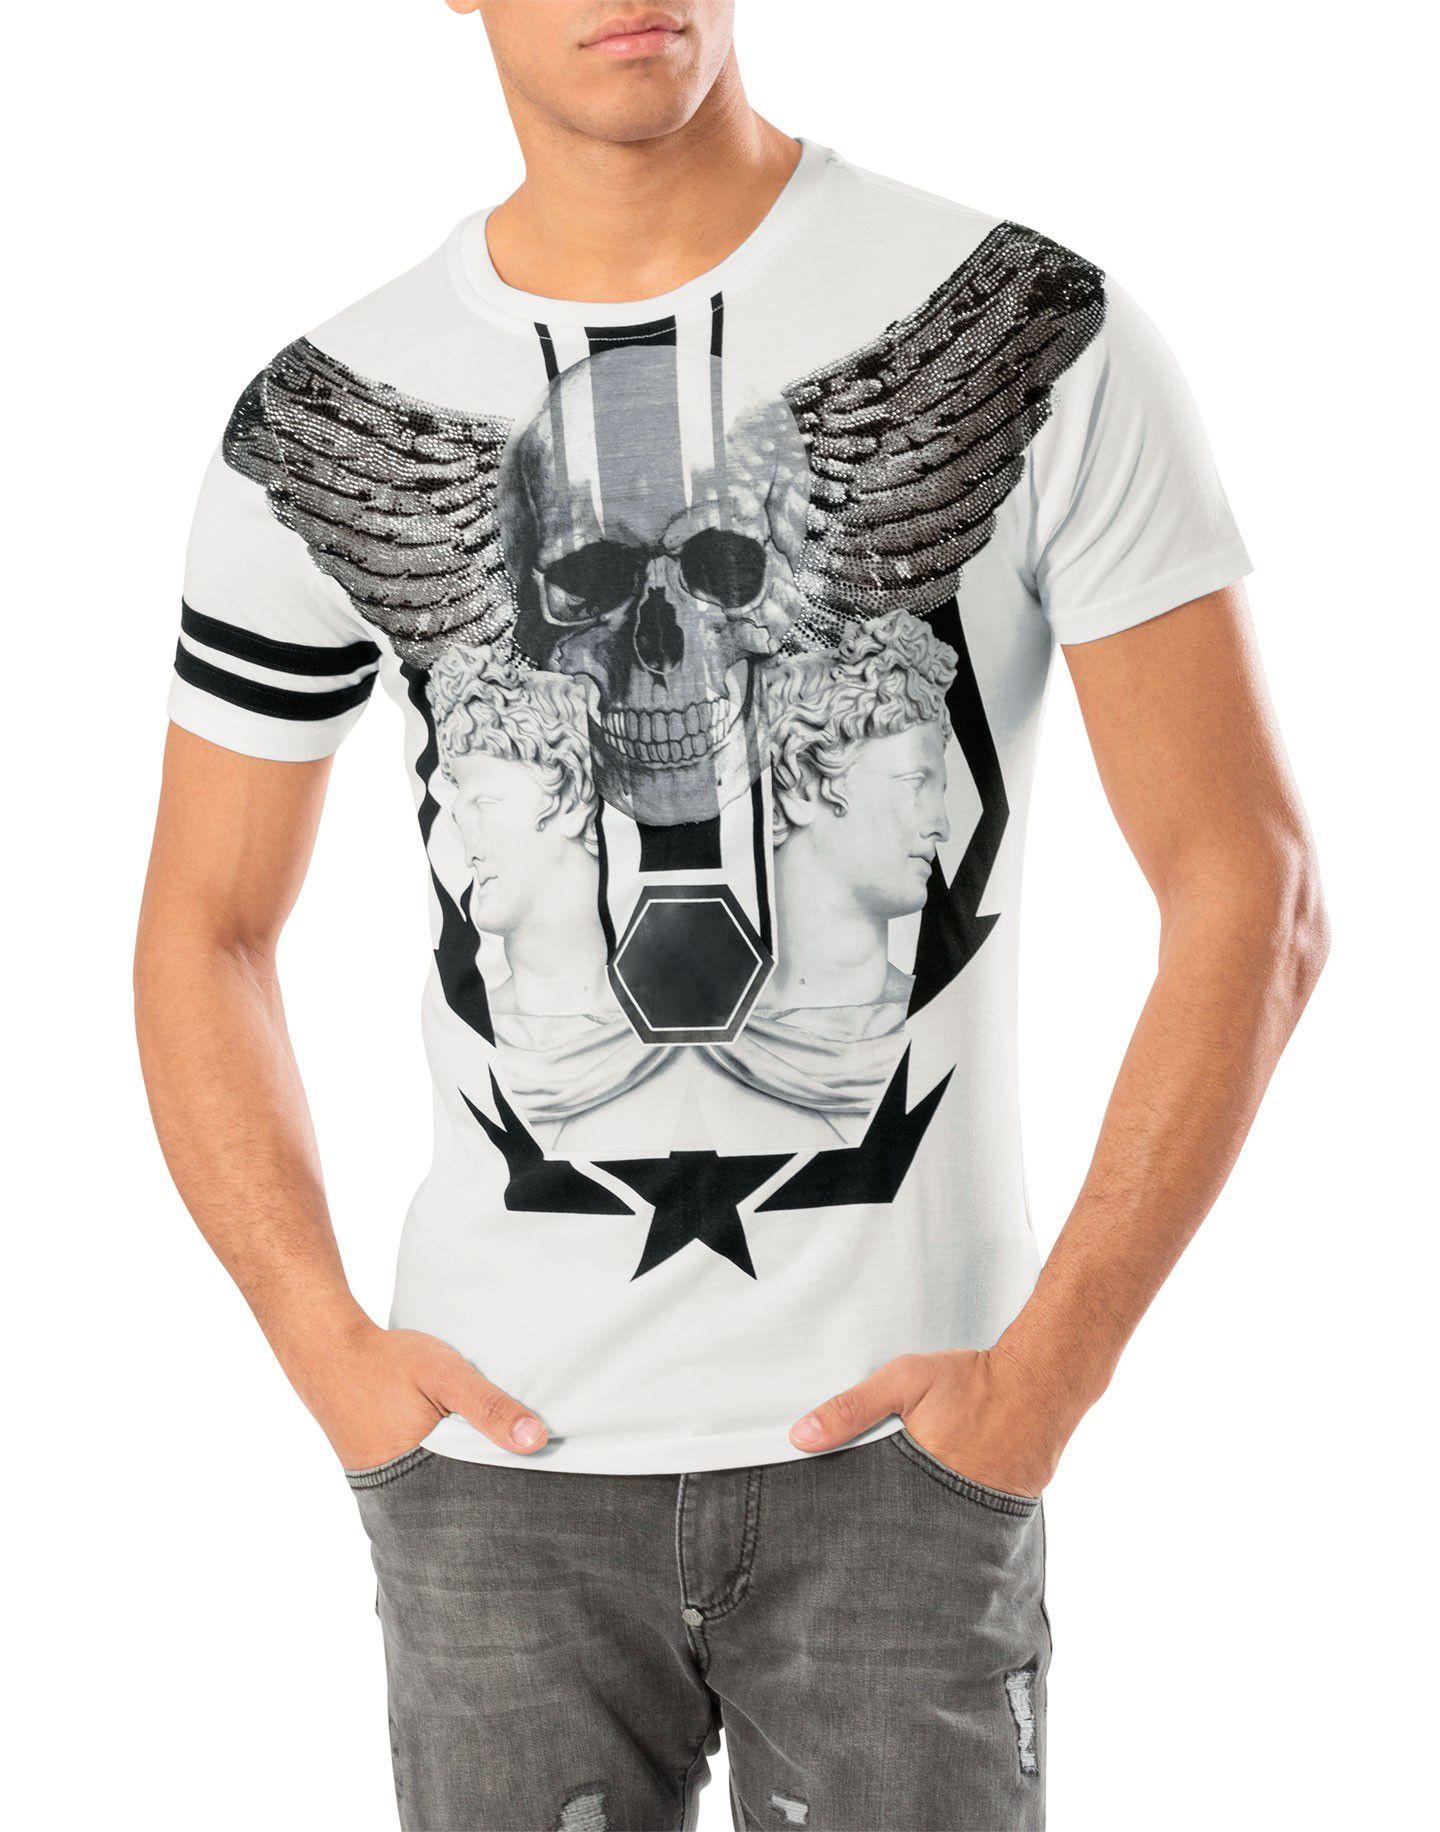 bdfc81cf5 Men T Shirt Rhinestone Skull Printed Graphic Tops Tees Casual T Shirt Homme  Crewneck Short Sleeves Tshirt Brand Clothing For Men Cool T Shirts T Shirts  ...